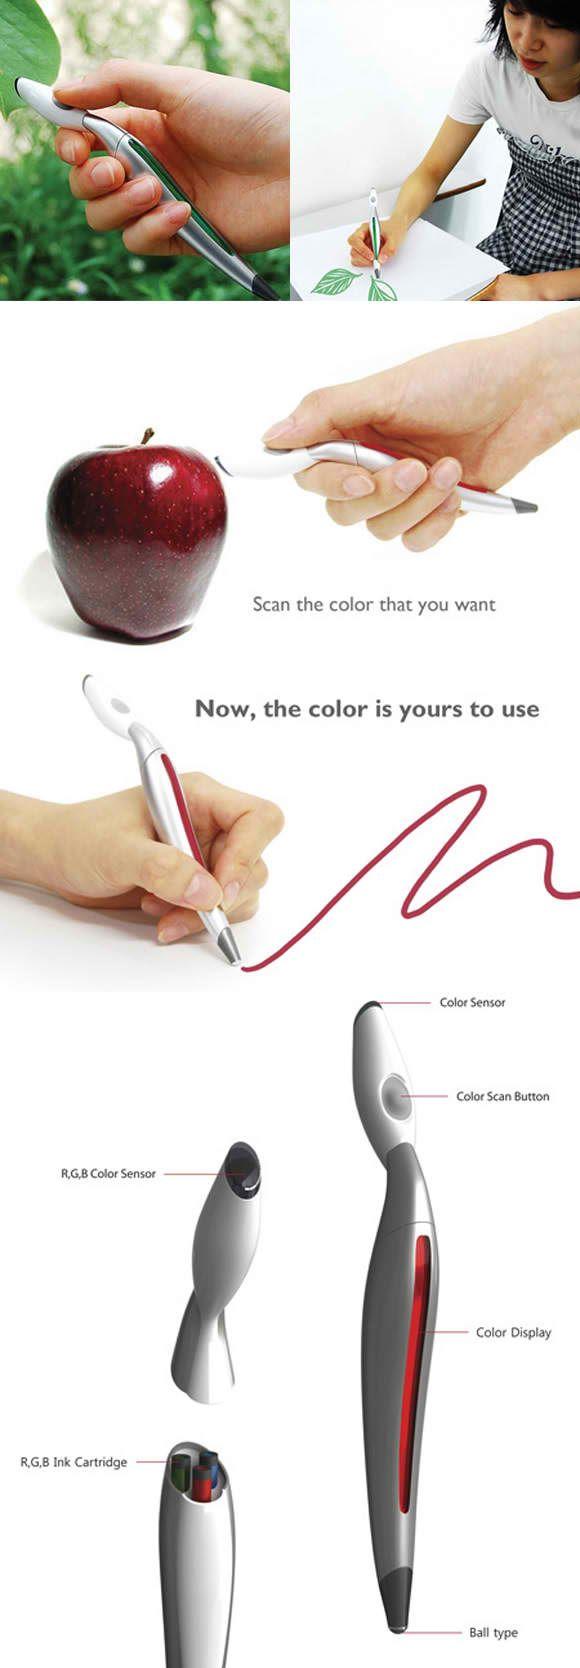 Color sensing pen